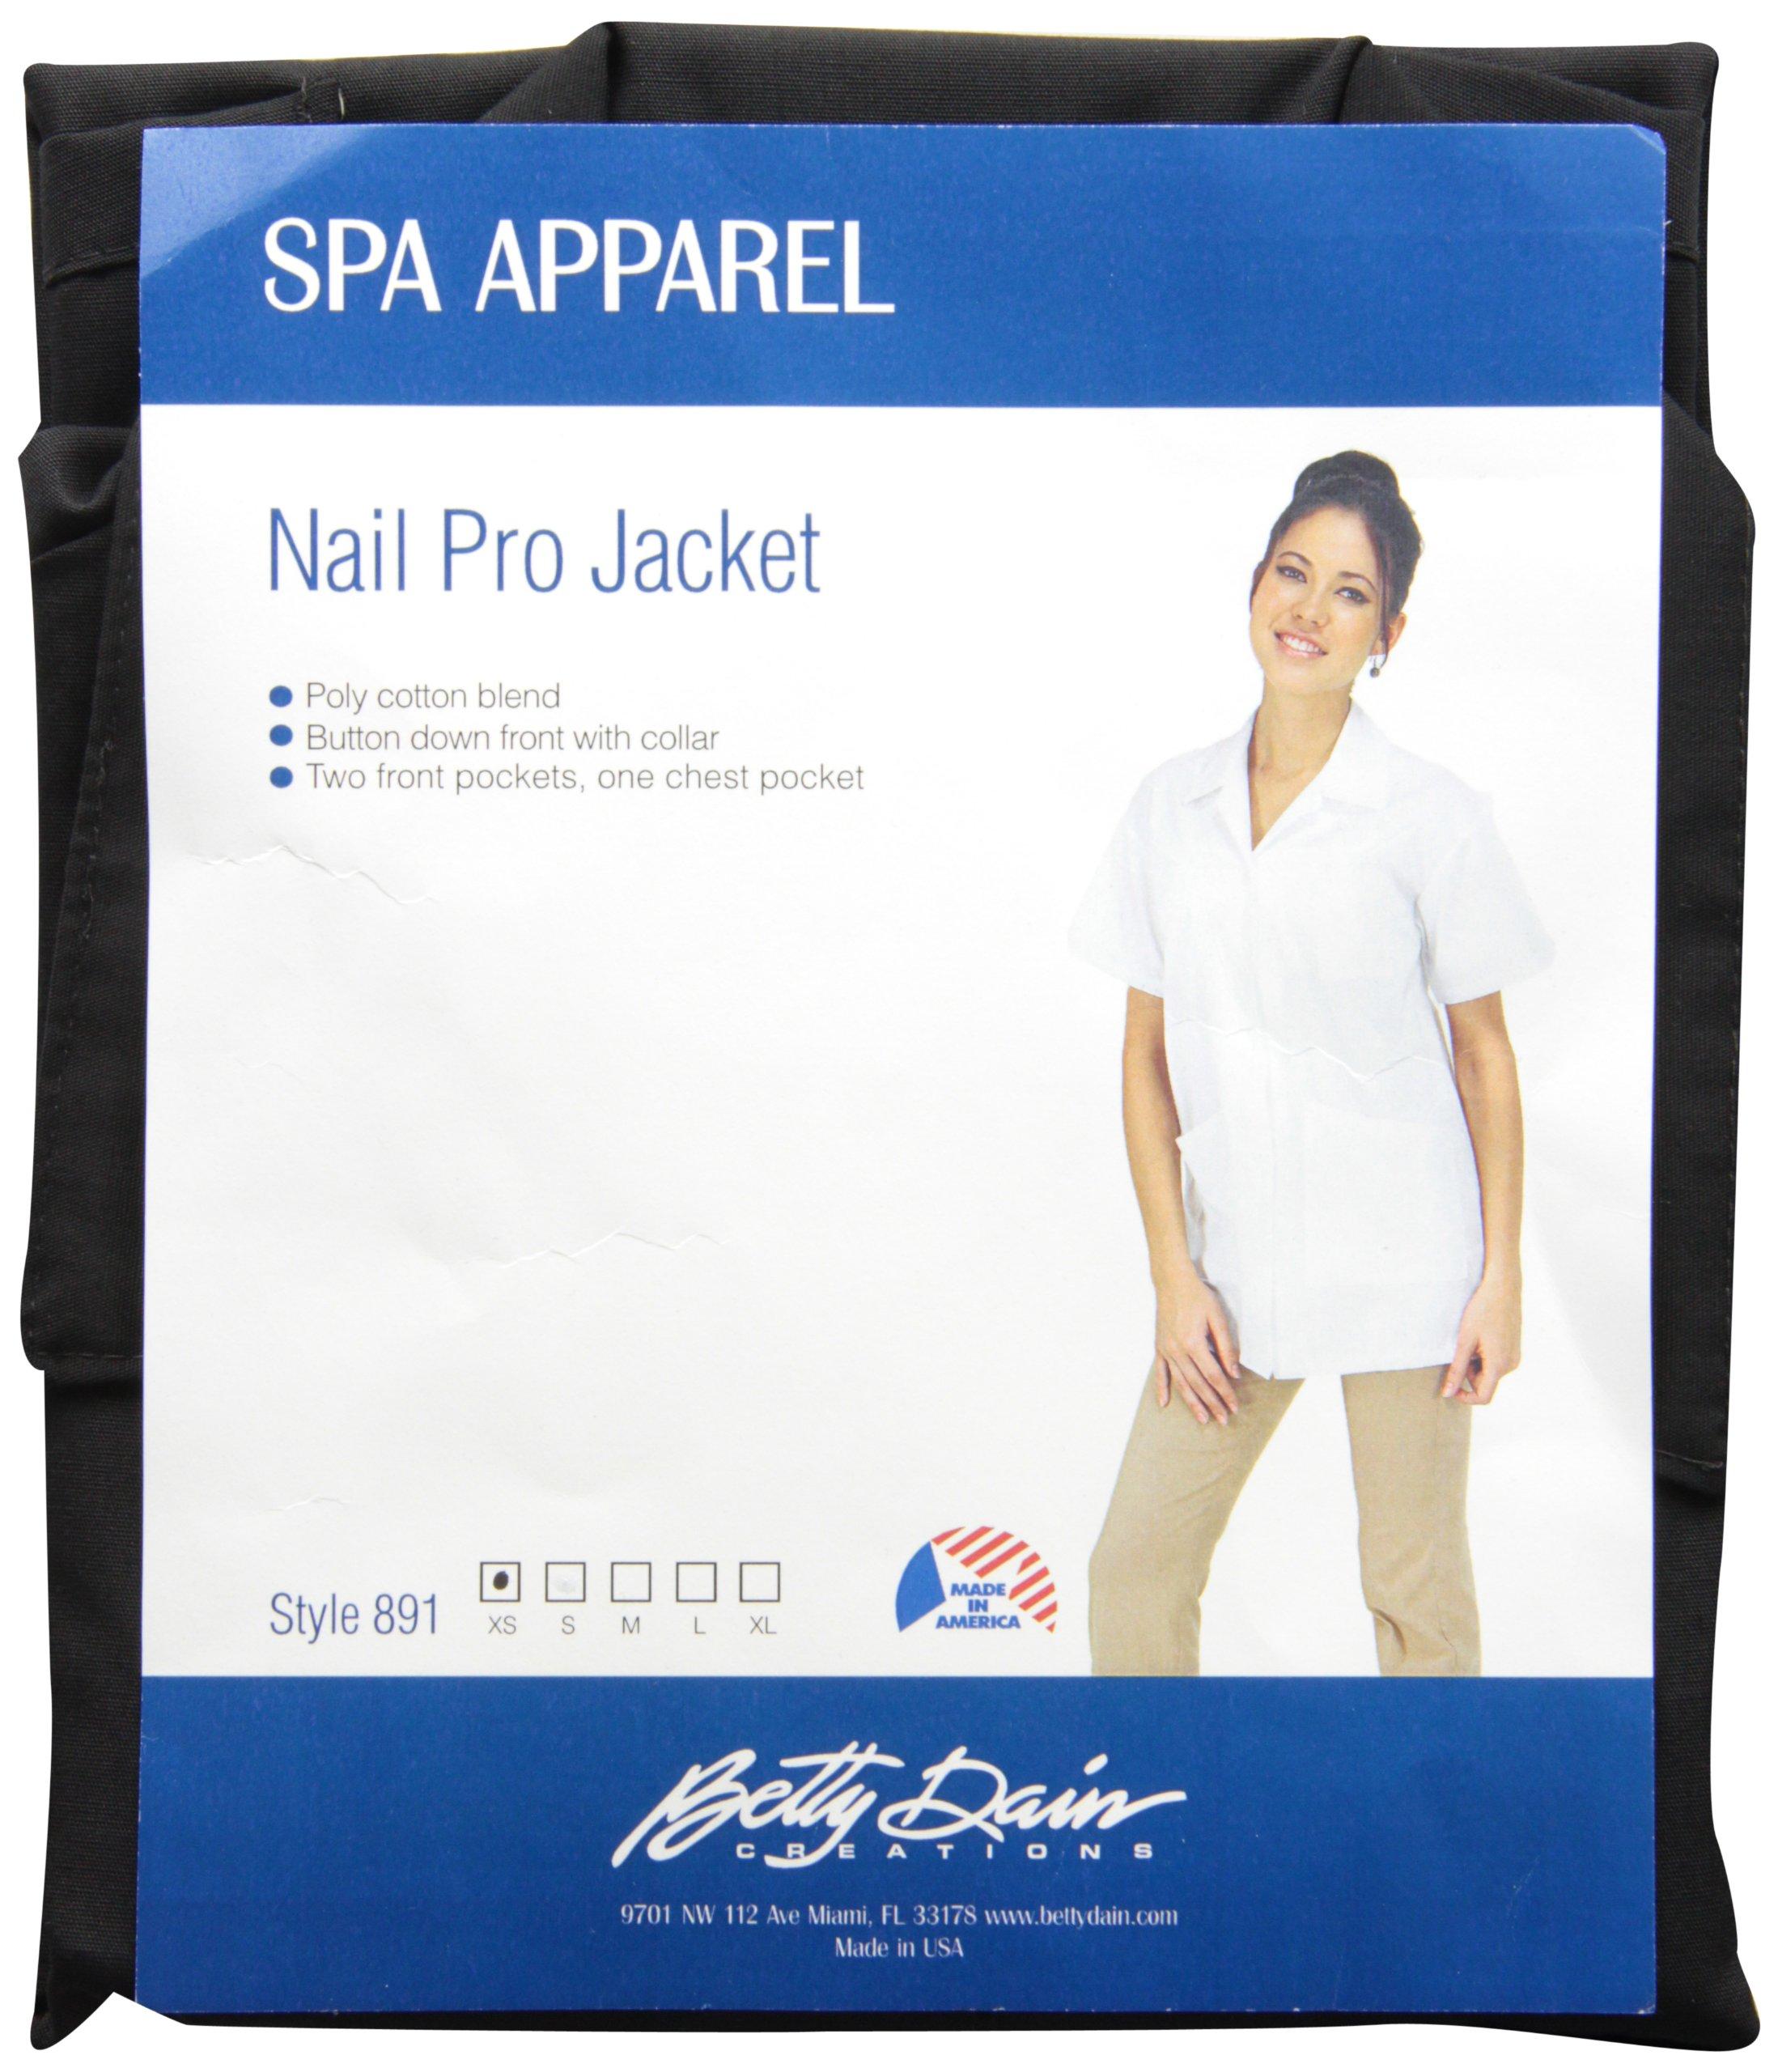 Betty Dain Professional Salon Nail Tech/Esthetician Jacket, Black, XS